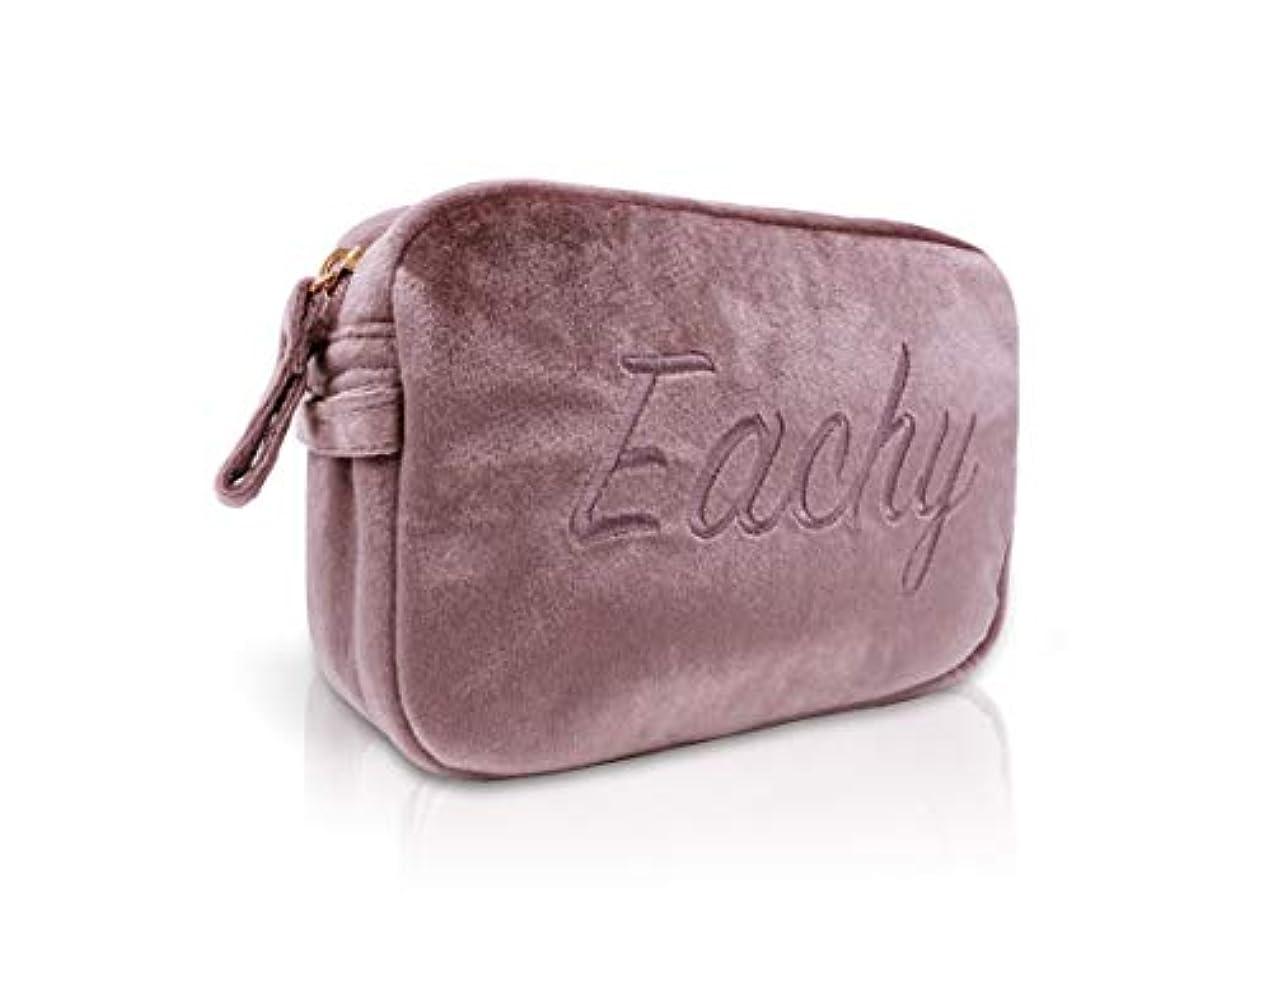 EACHY 化粧ポーチ 大容量 コスメポーチ メイクポーチ ベロア レディース MAKE-UP POUCH 全2色 (ピンク)